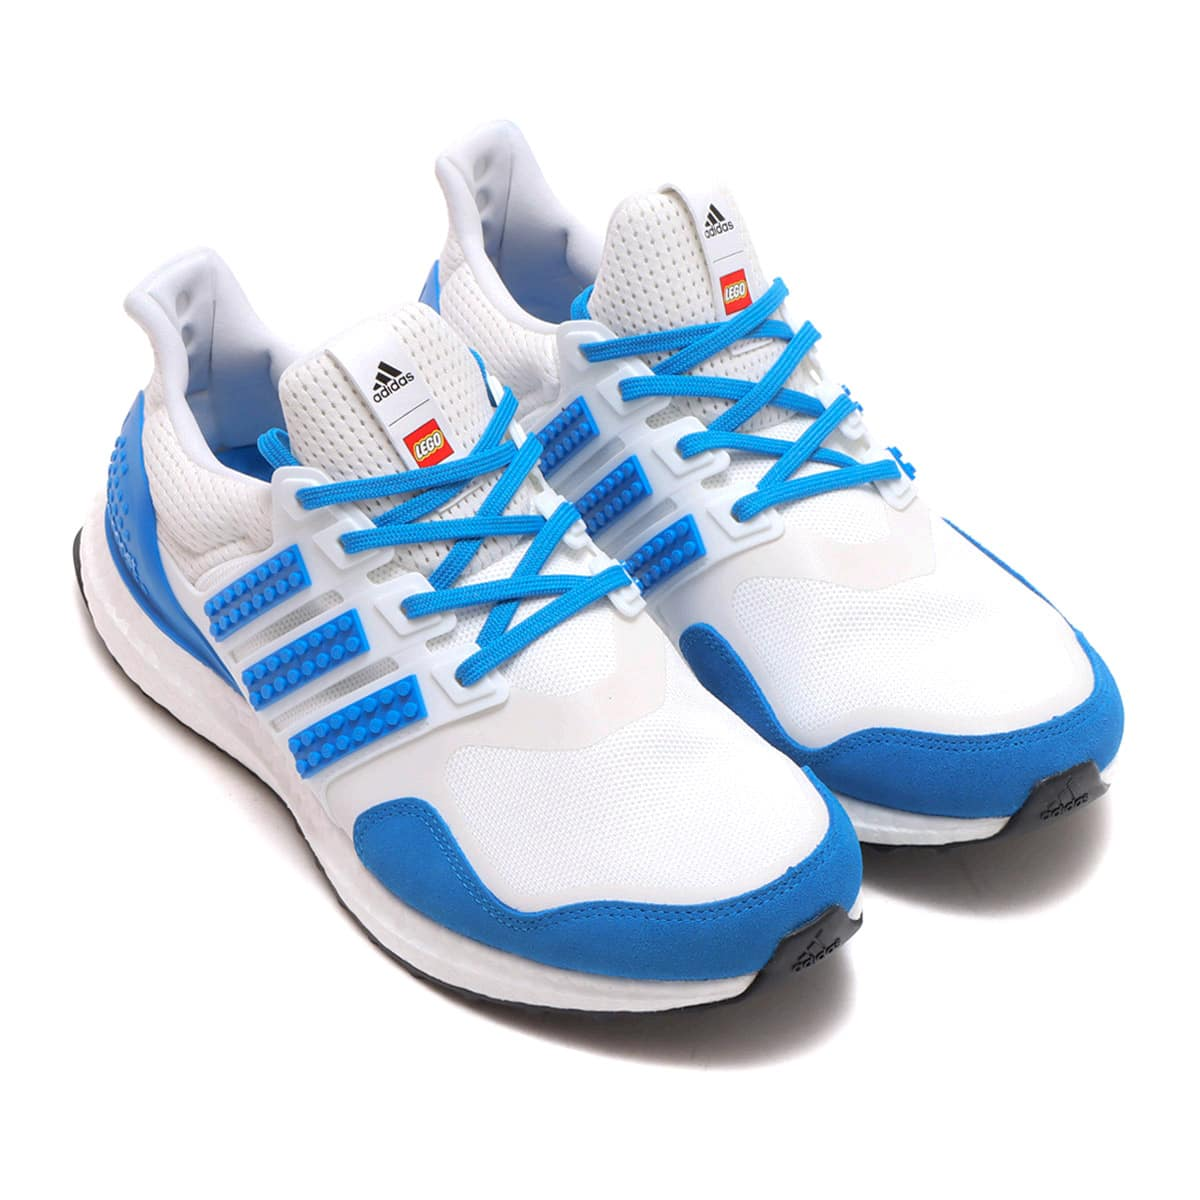 adidas ULTRABOOST X LEGO FOOTWEAR WHITE/SHOCK BLUE/CORE BLACK 21FW-S_photo_large